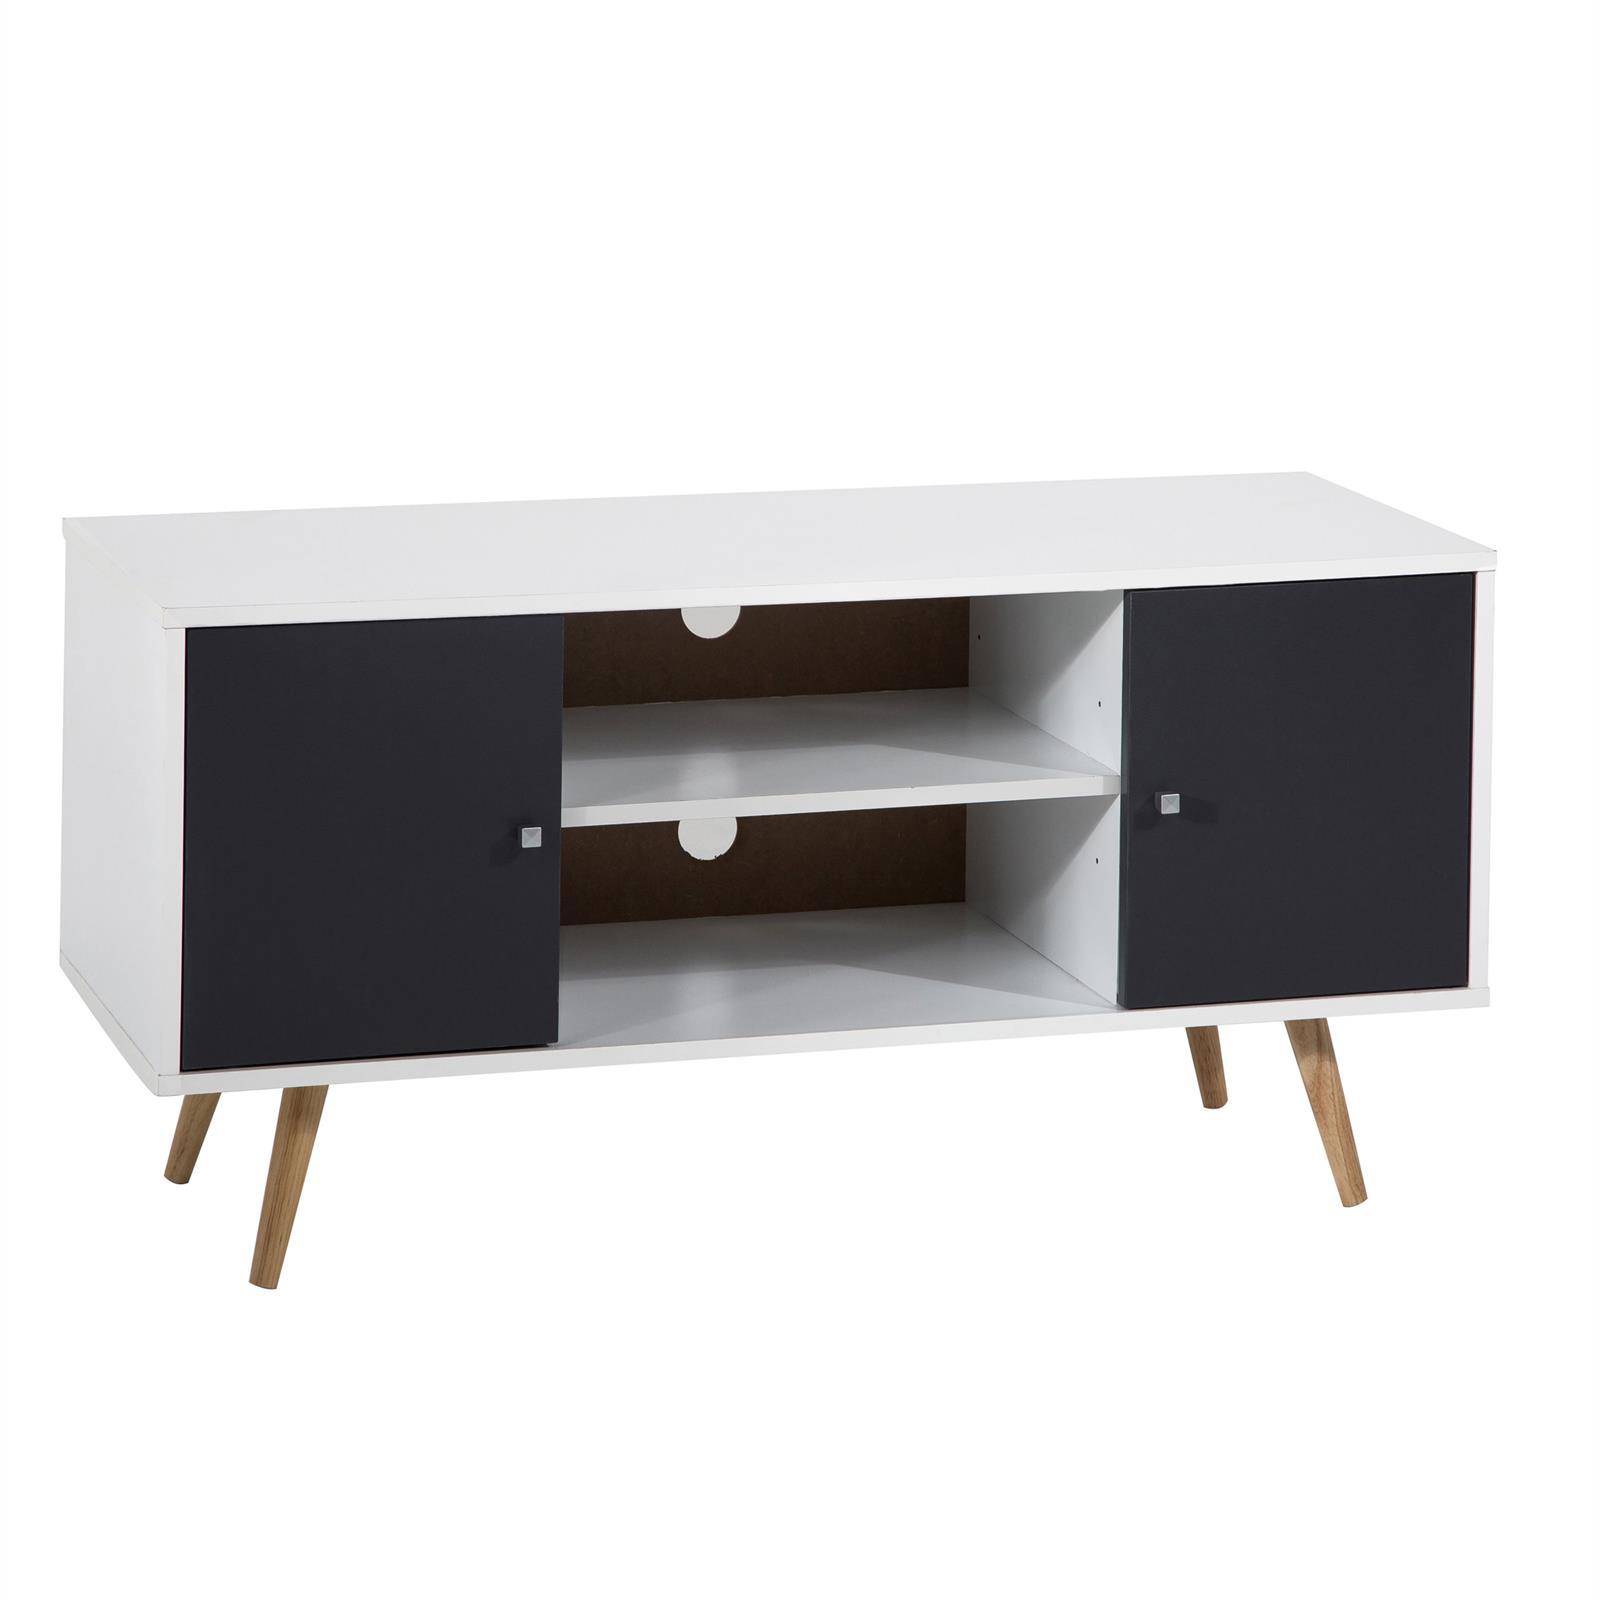 tv lowboard murica in wei grau foliert mobilia24. Black Bedroom Furniture Sets. Home Design Ideas